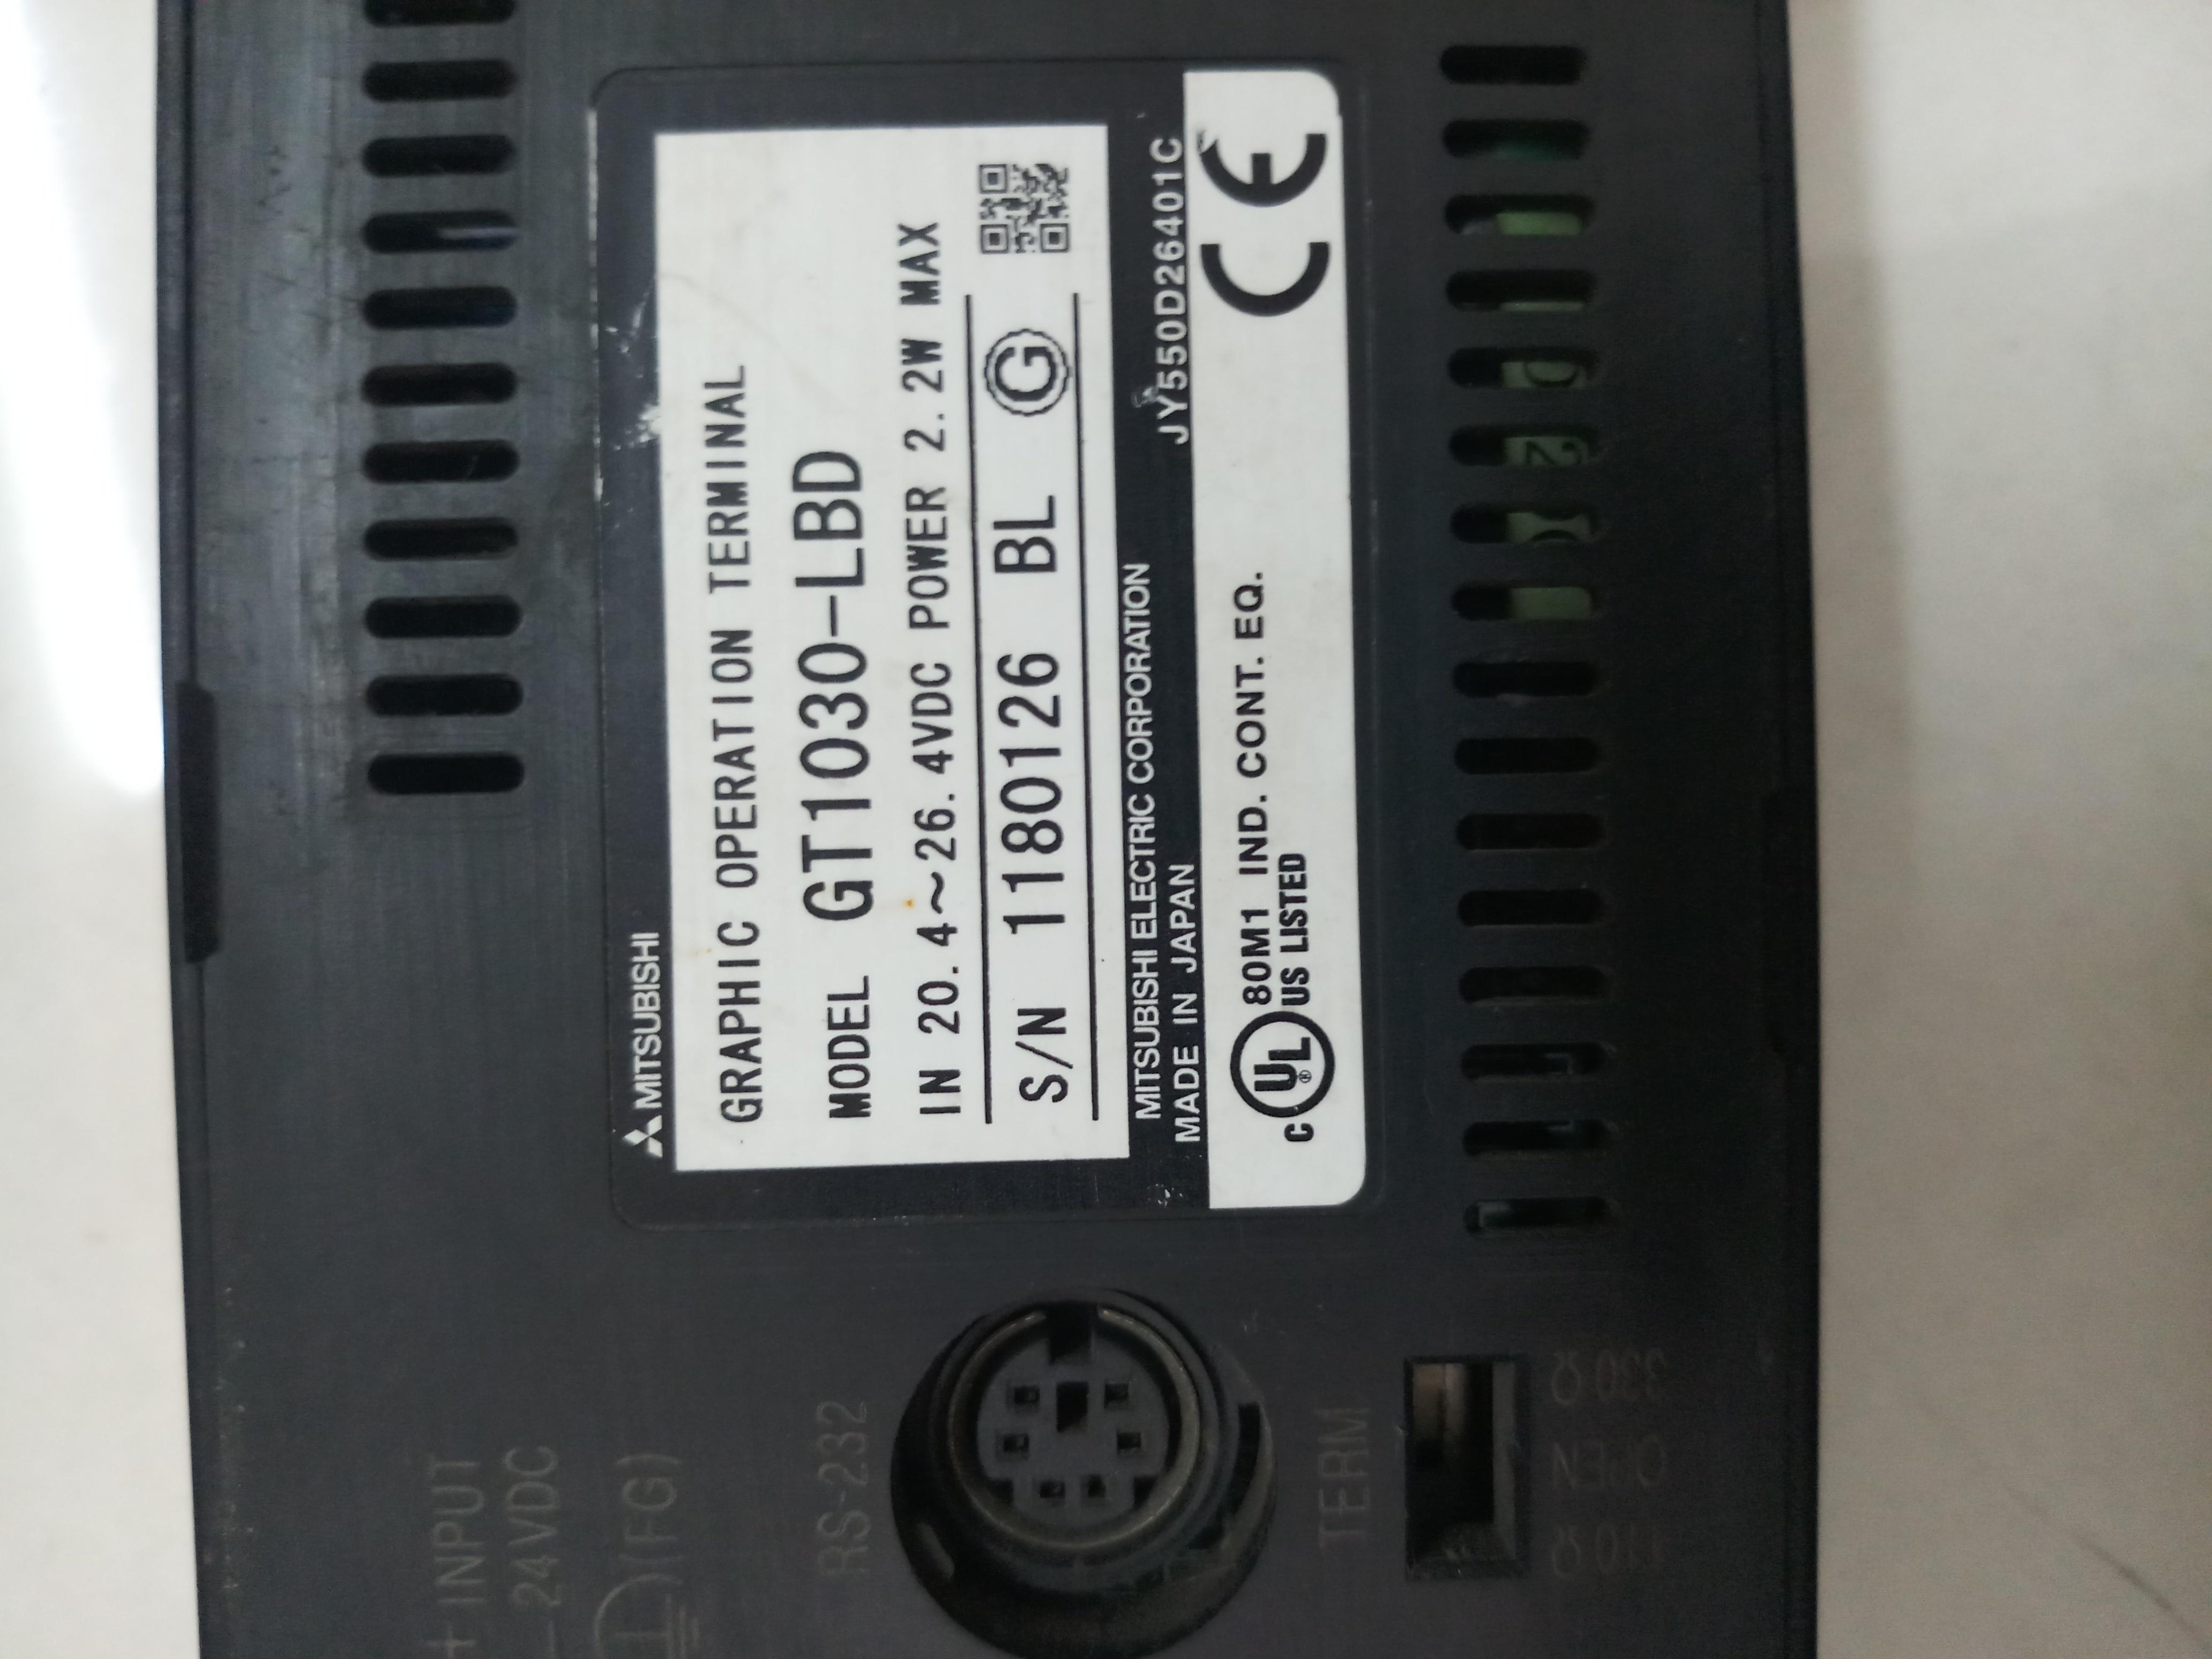 MITSUBISHI GT1030-LBD